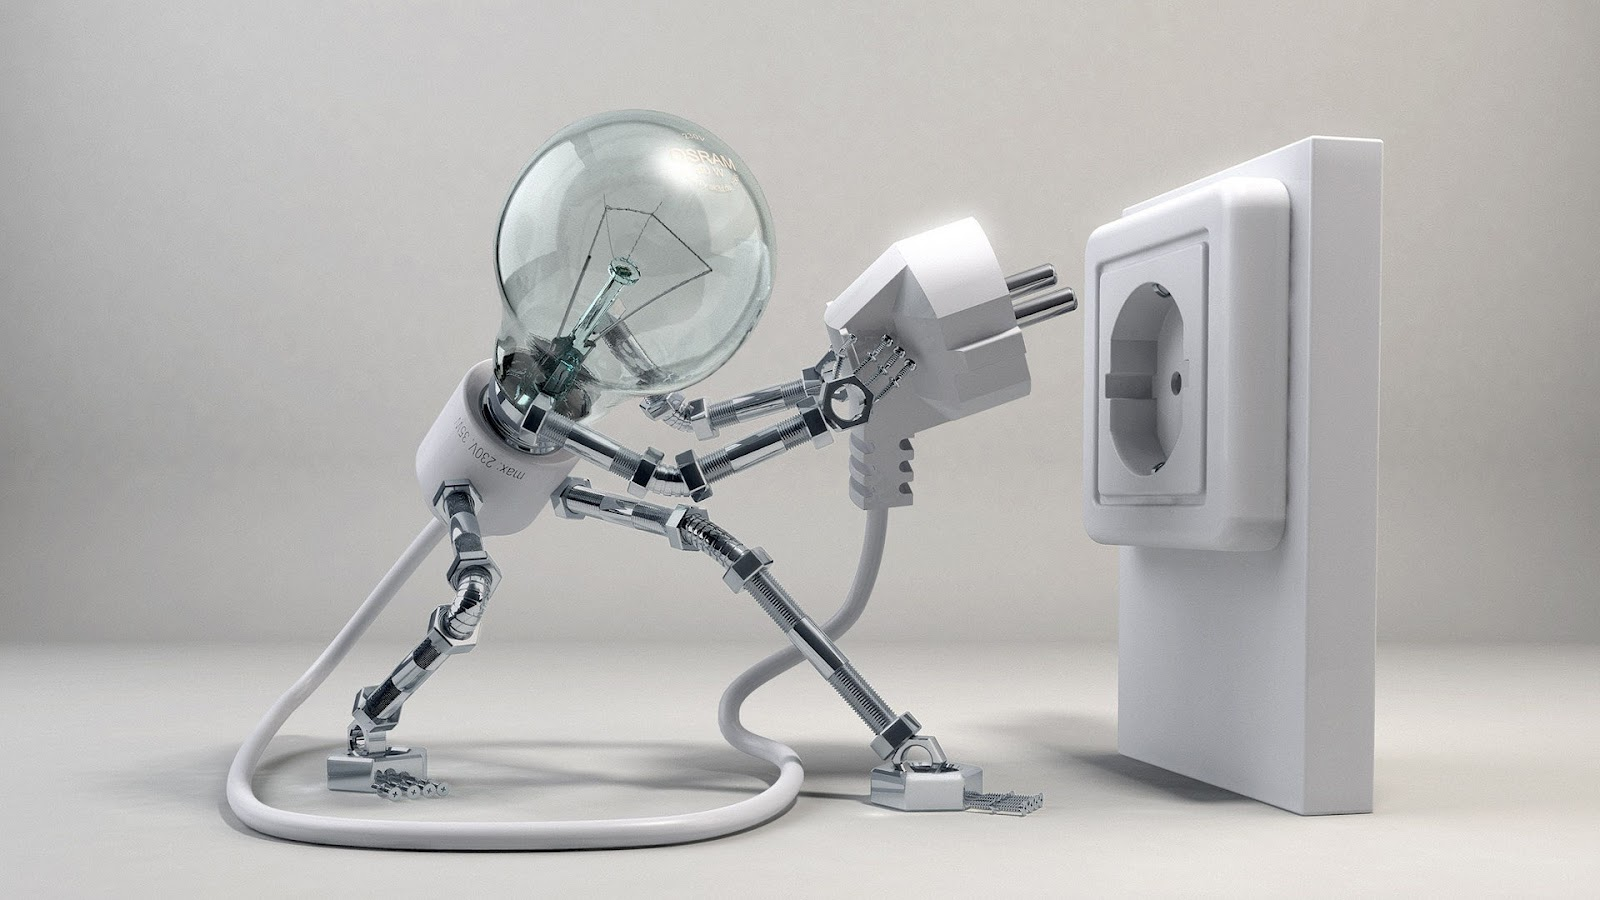 http://2.bp.blogspot.com/-IdljO-1nErY/UEy5lylxlrI/AAAAAAAAFJc/OtQfinKXQuM/s1600/electricity_3d_bulb_funny_artwork-1080.jpg